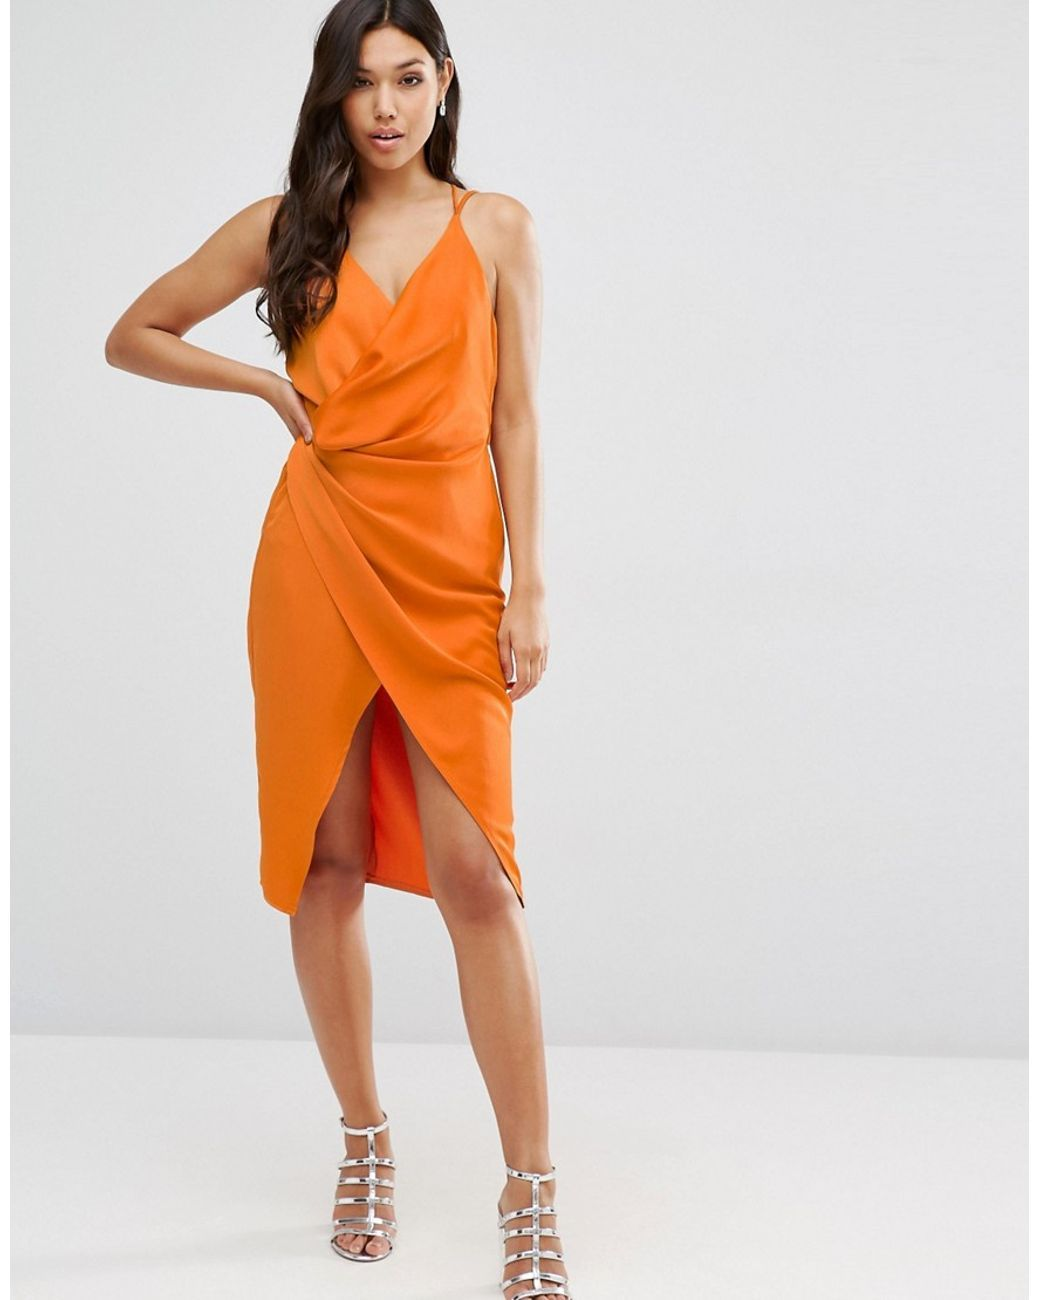 Asos Orange Strappy Drape Front Midi Dress Orange Midi Dress High Fashion Street Style Fashion [ 1300 x 1040 Pixel ]